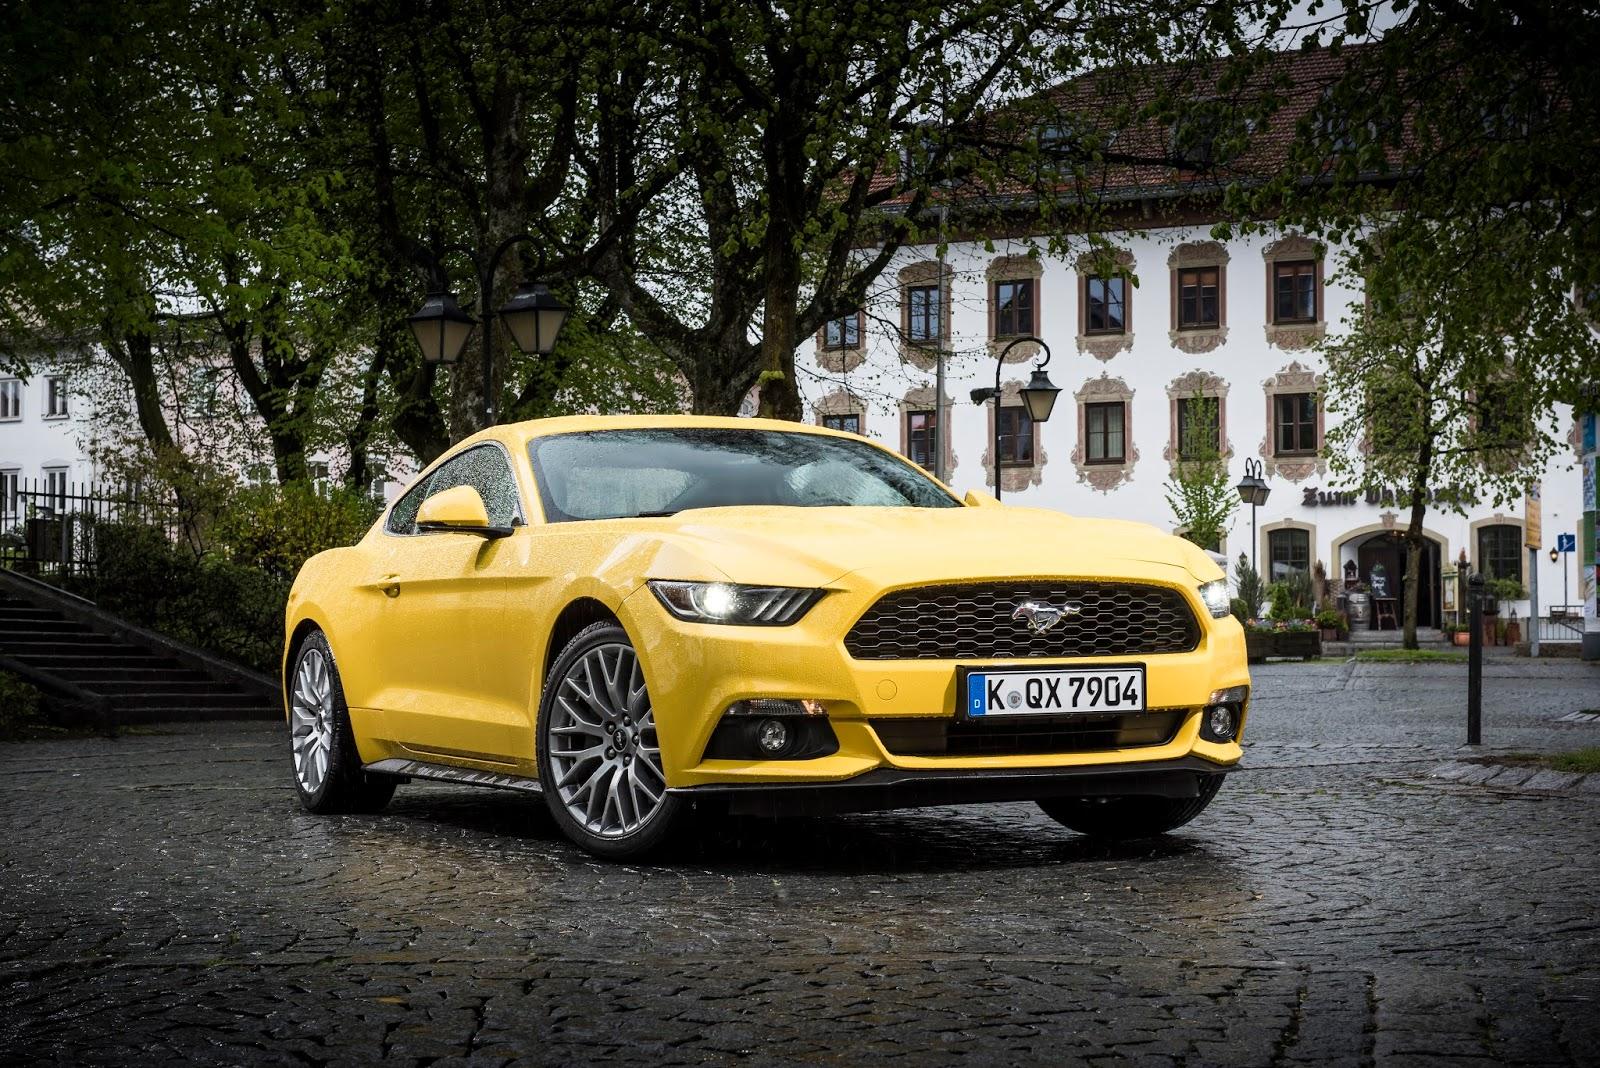 Best SellingSportsCar MustangGermany Ο... τυφώνας Ford Mustang εξαπλώνεται σε όλο τον κόσμο και ξεπουλάει! Bestseller, cabrio, Ford Mustang, Muscle cars, Sales, πωλήσεις, πωλήσεις αυτοκινήτων